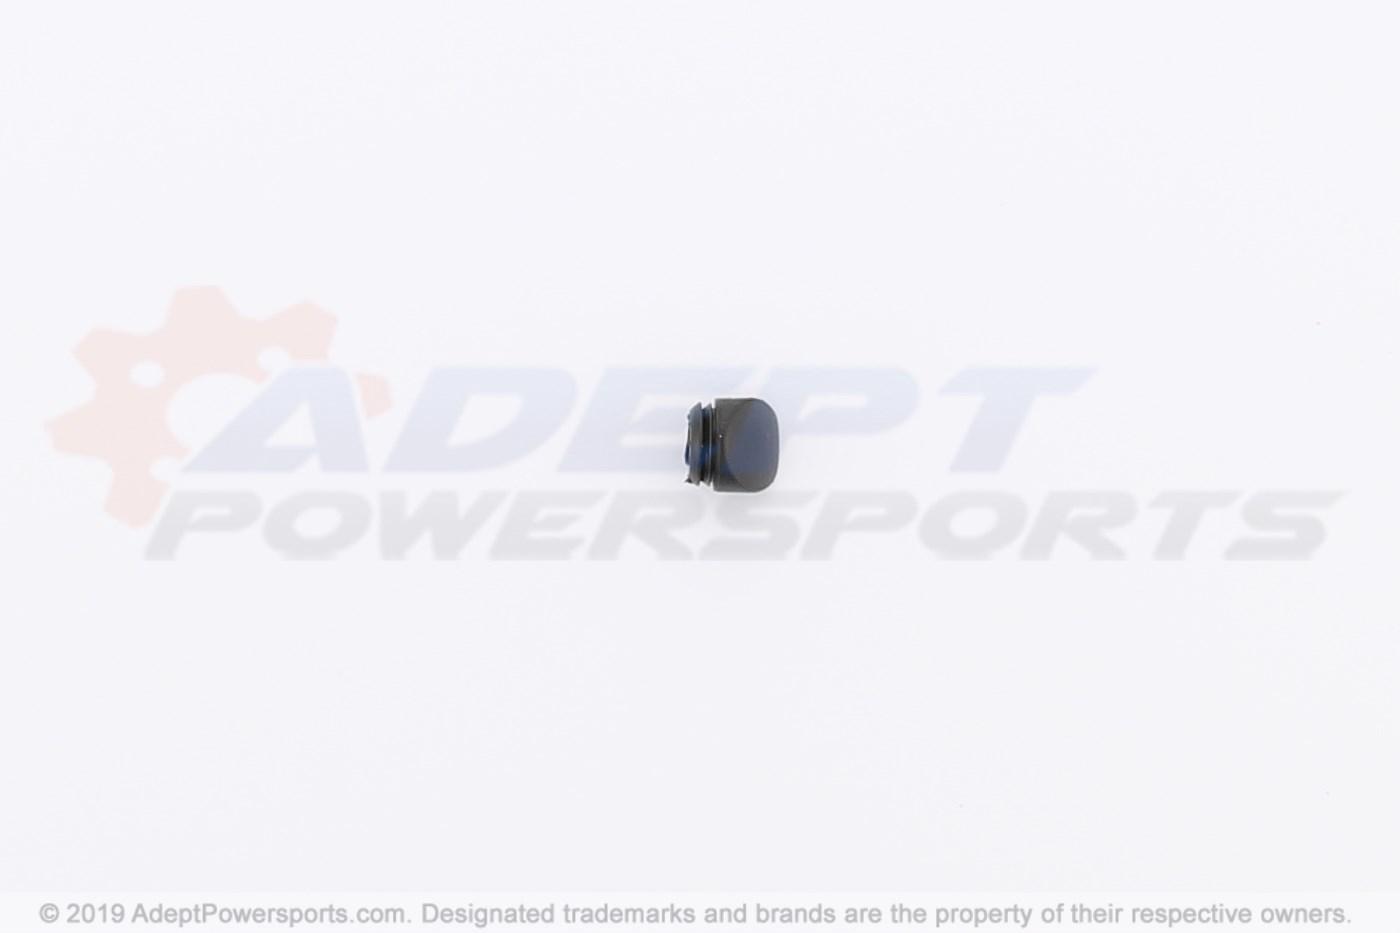 09- Kart Seat replacement parts for 2005 Sea Doo 3D RFI